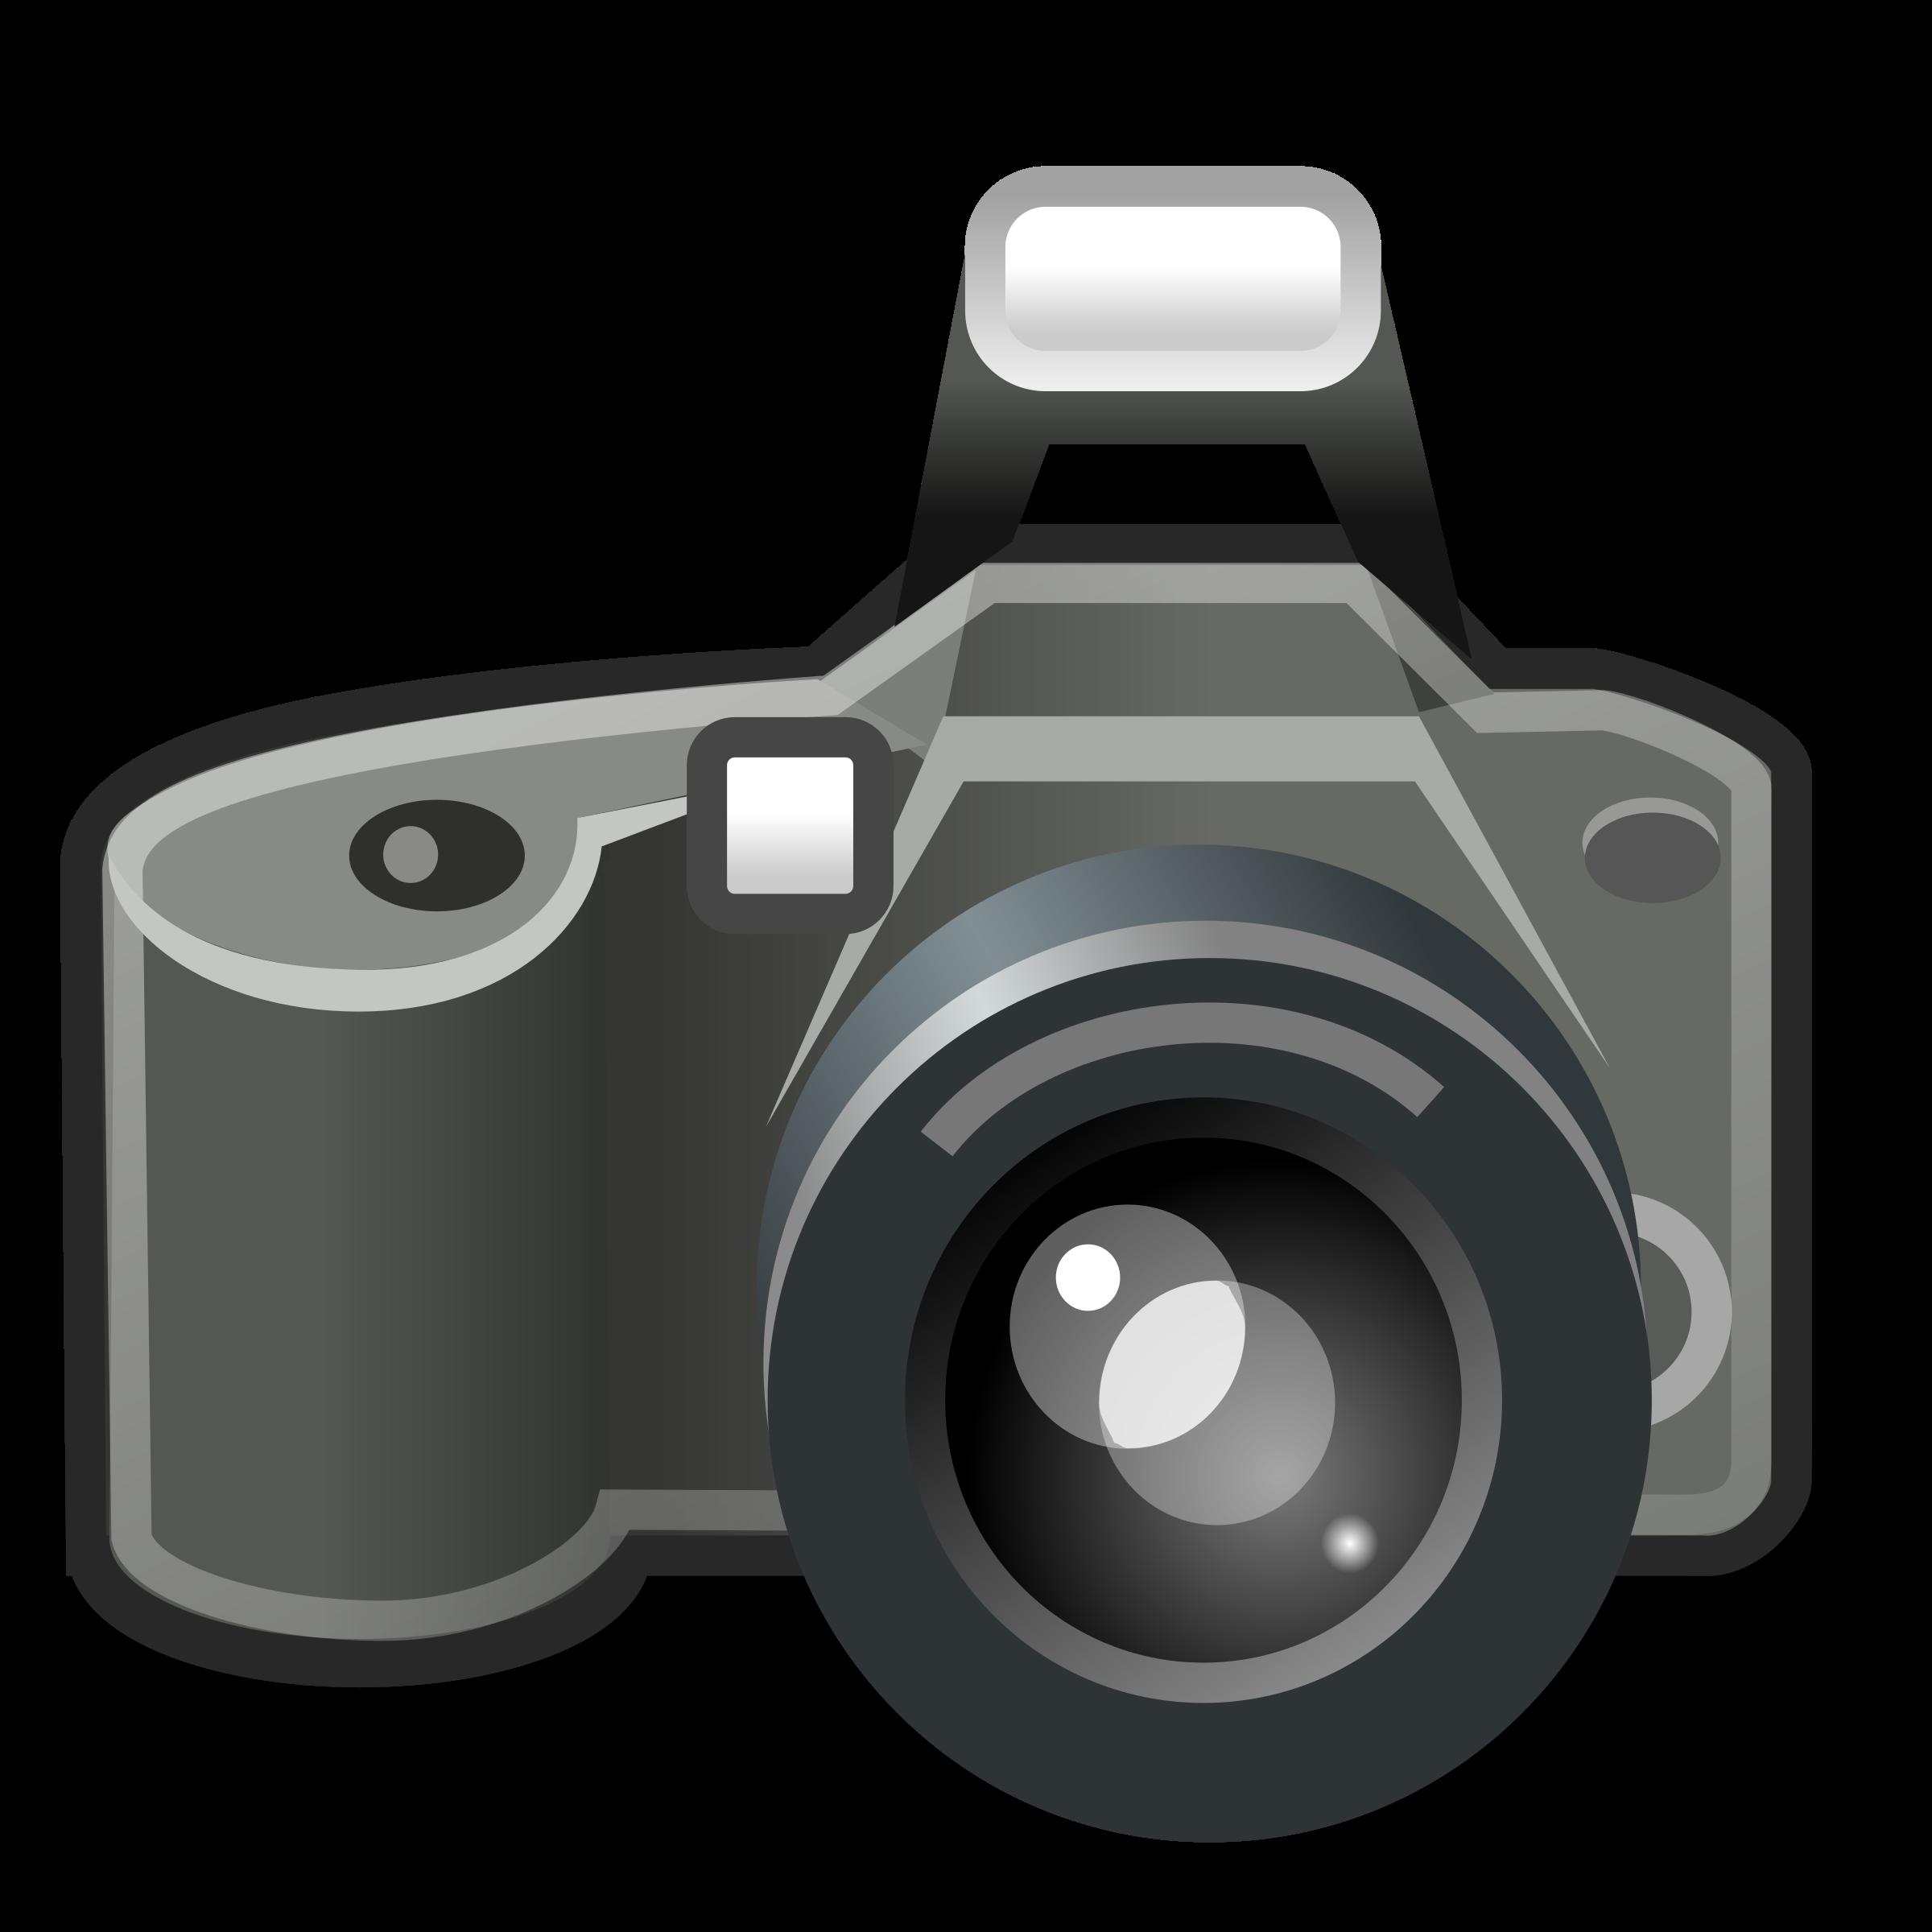 Computer clipart digital camera. Tango photo big image